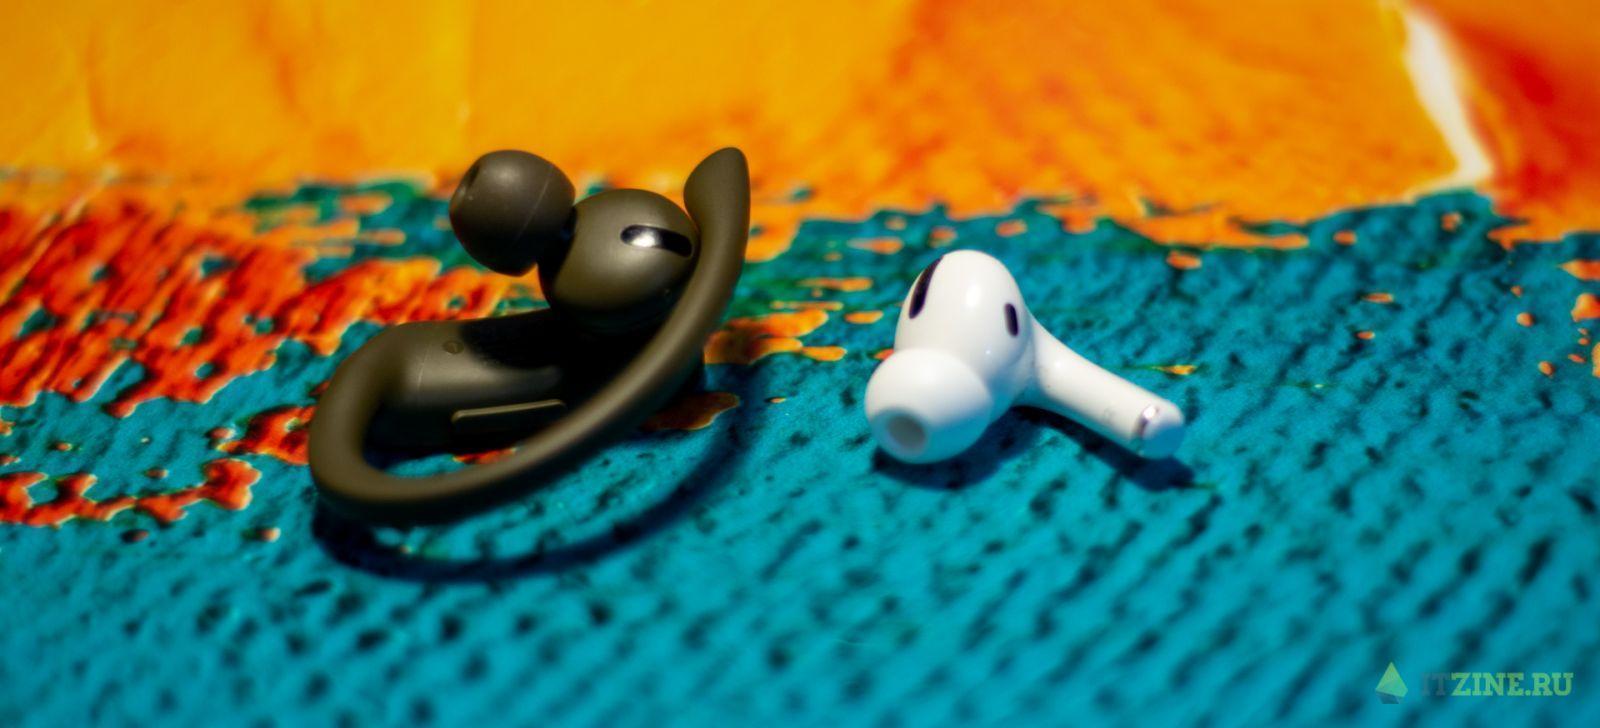 Наушник Beats PowerBeats Pro и AirPods Pro